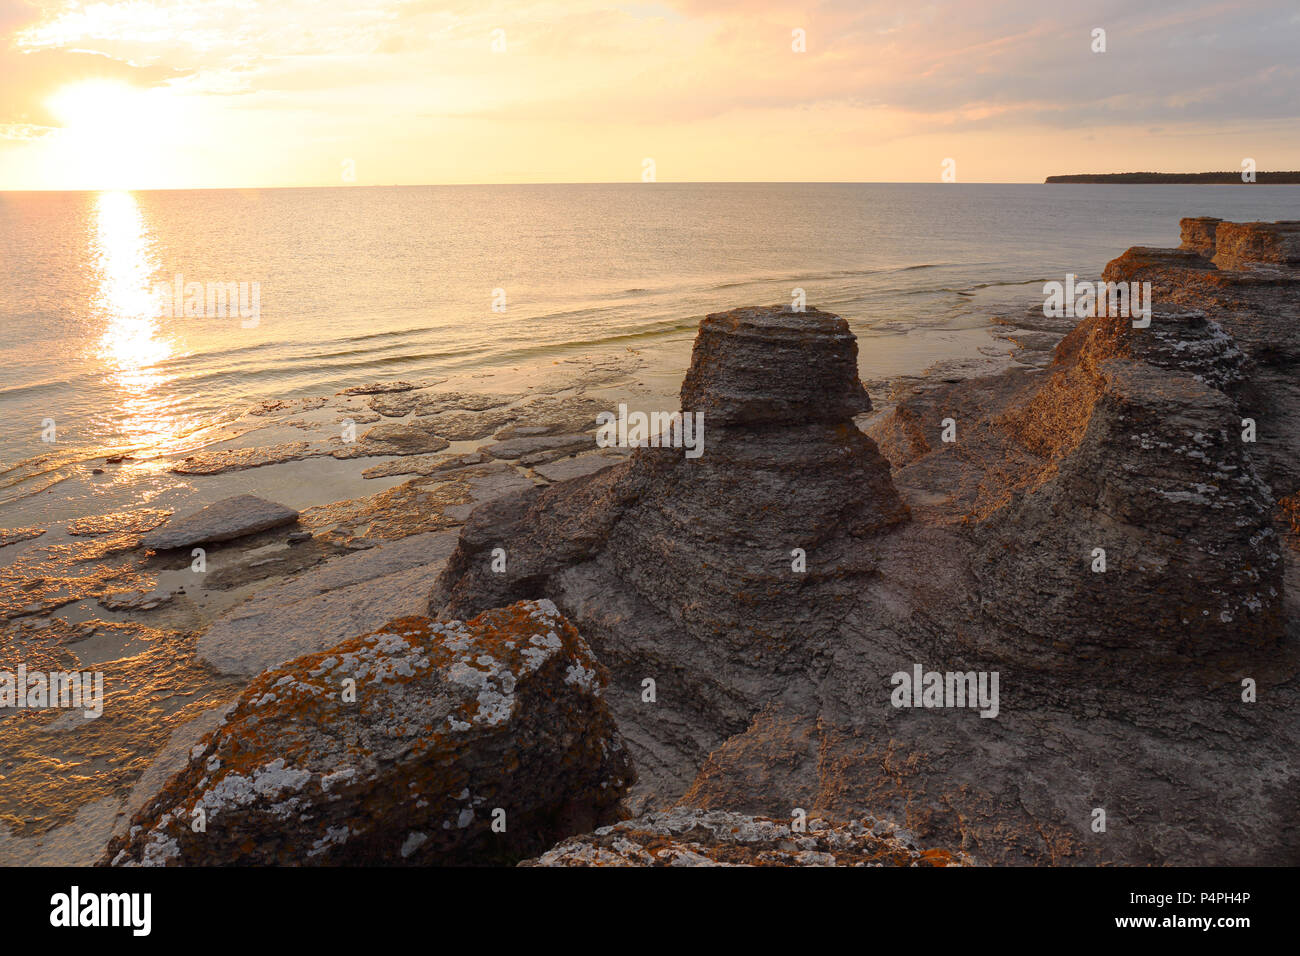 sea-stacks-at-byrum-land-sweden-P4PH4P.jpg